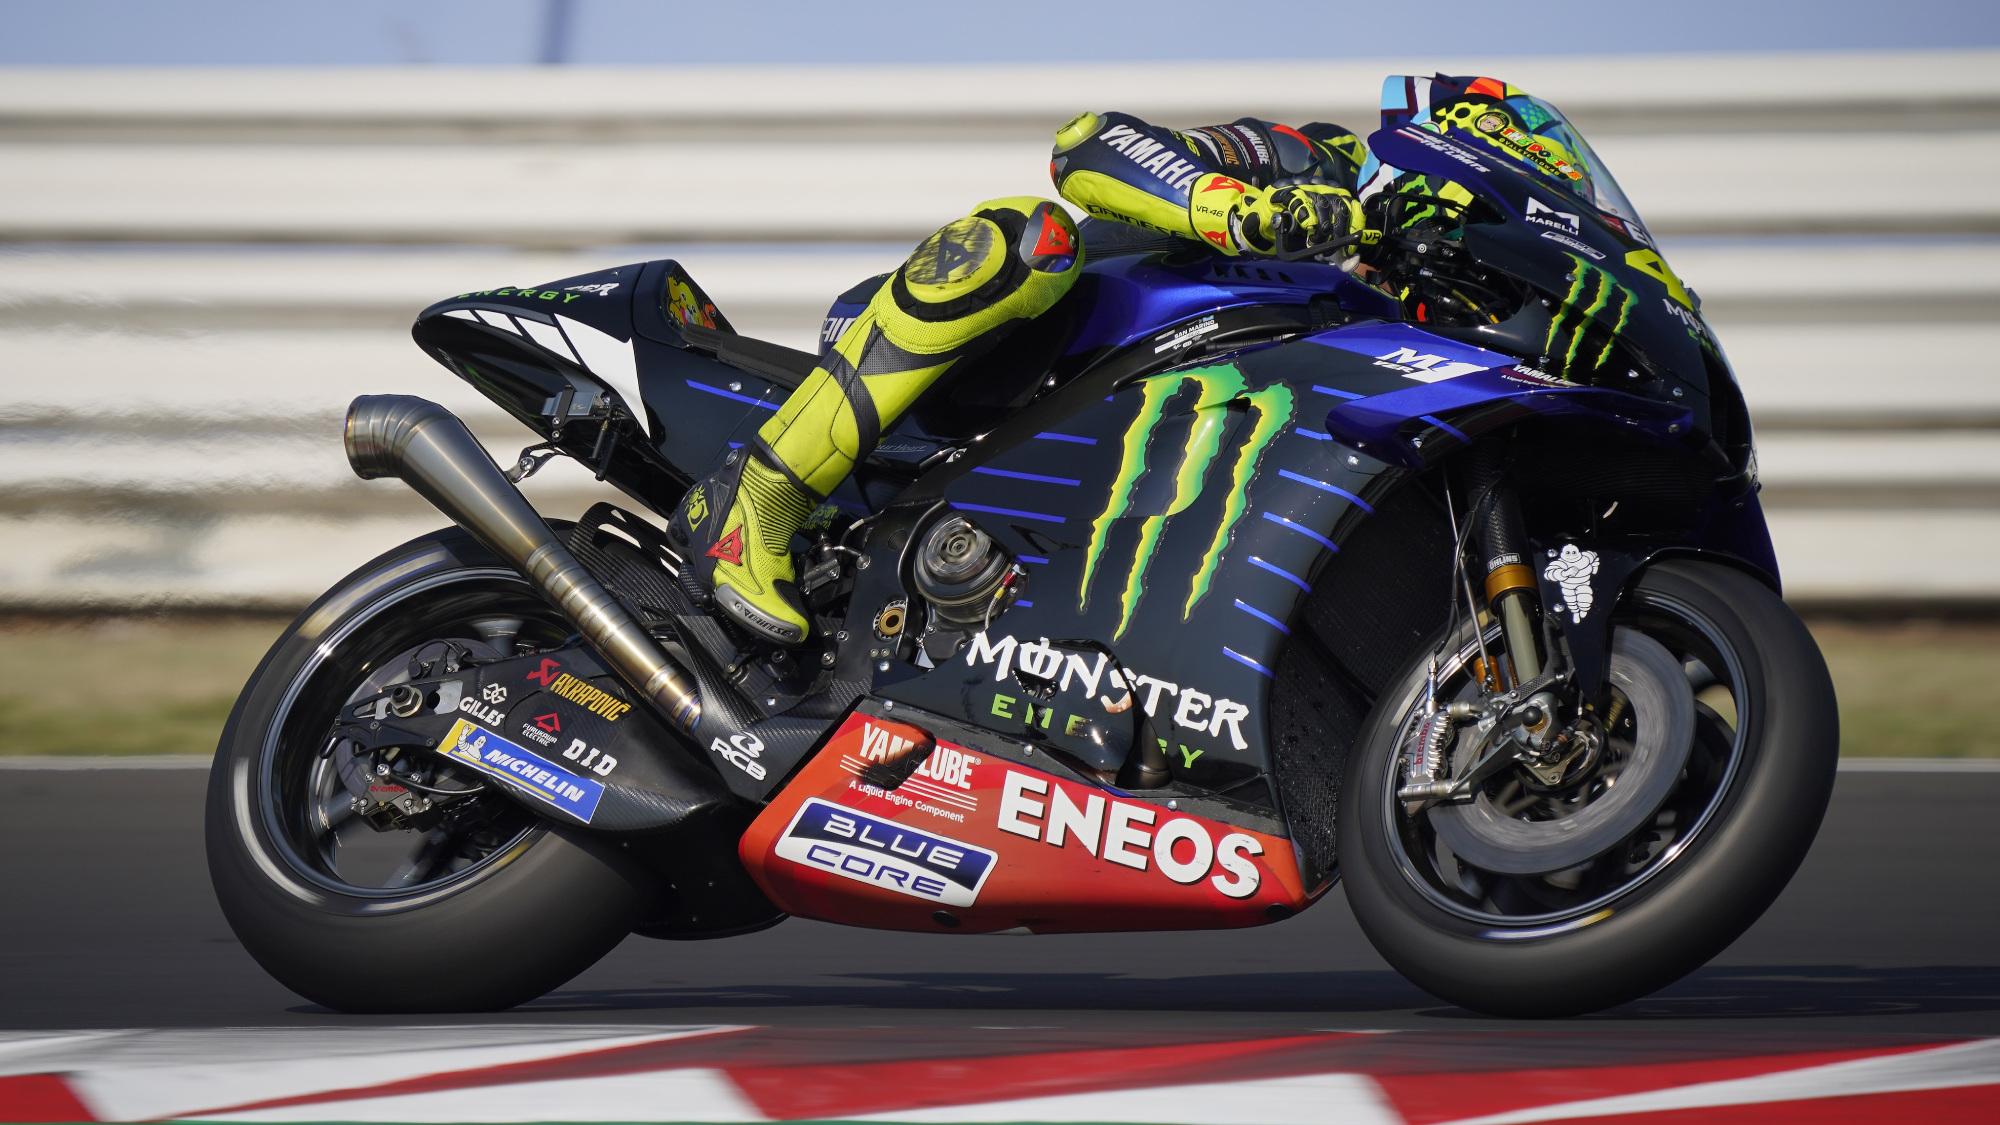 Valentino Rossi, Misano test 2020